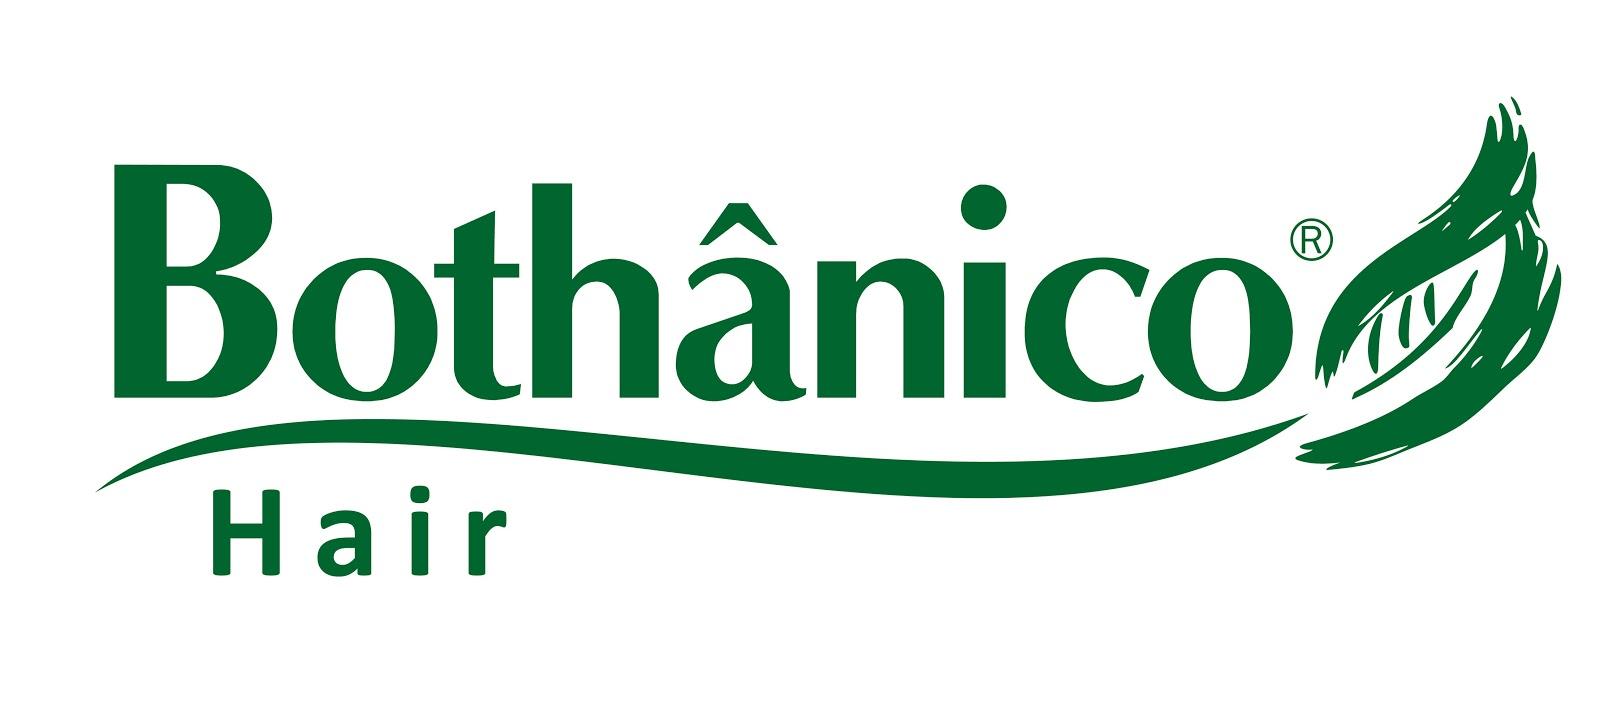 Bothanico